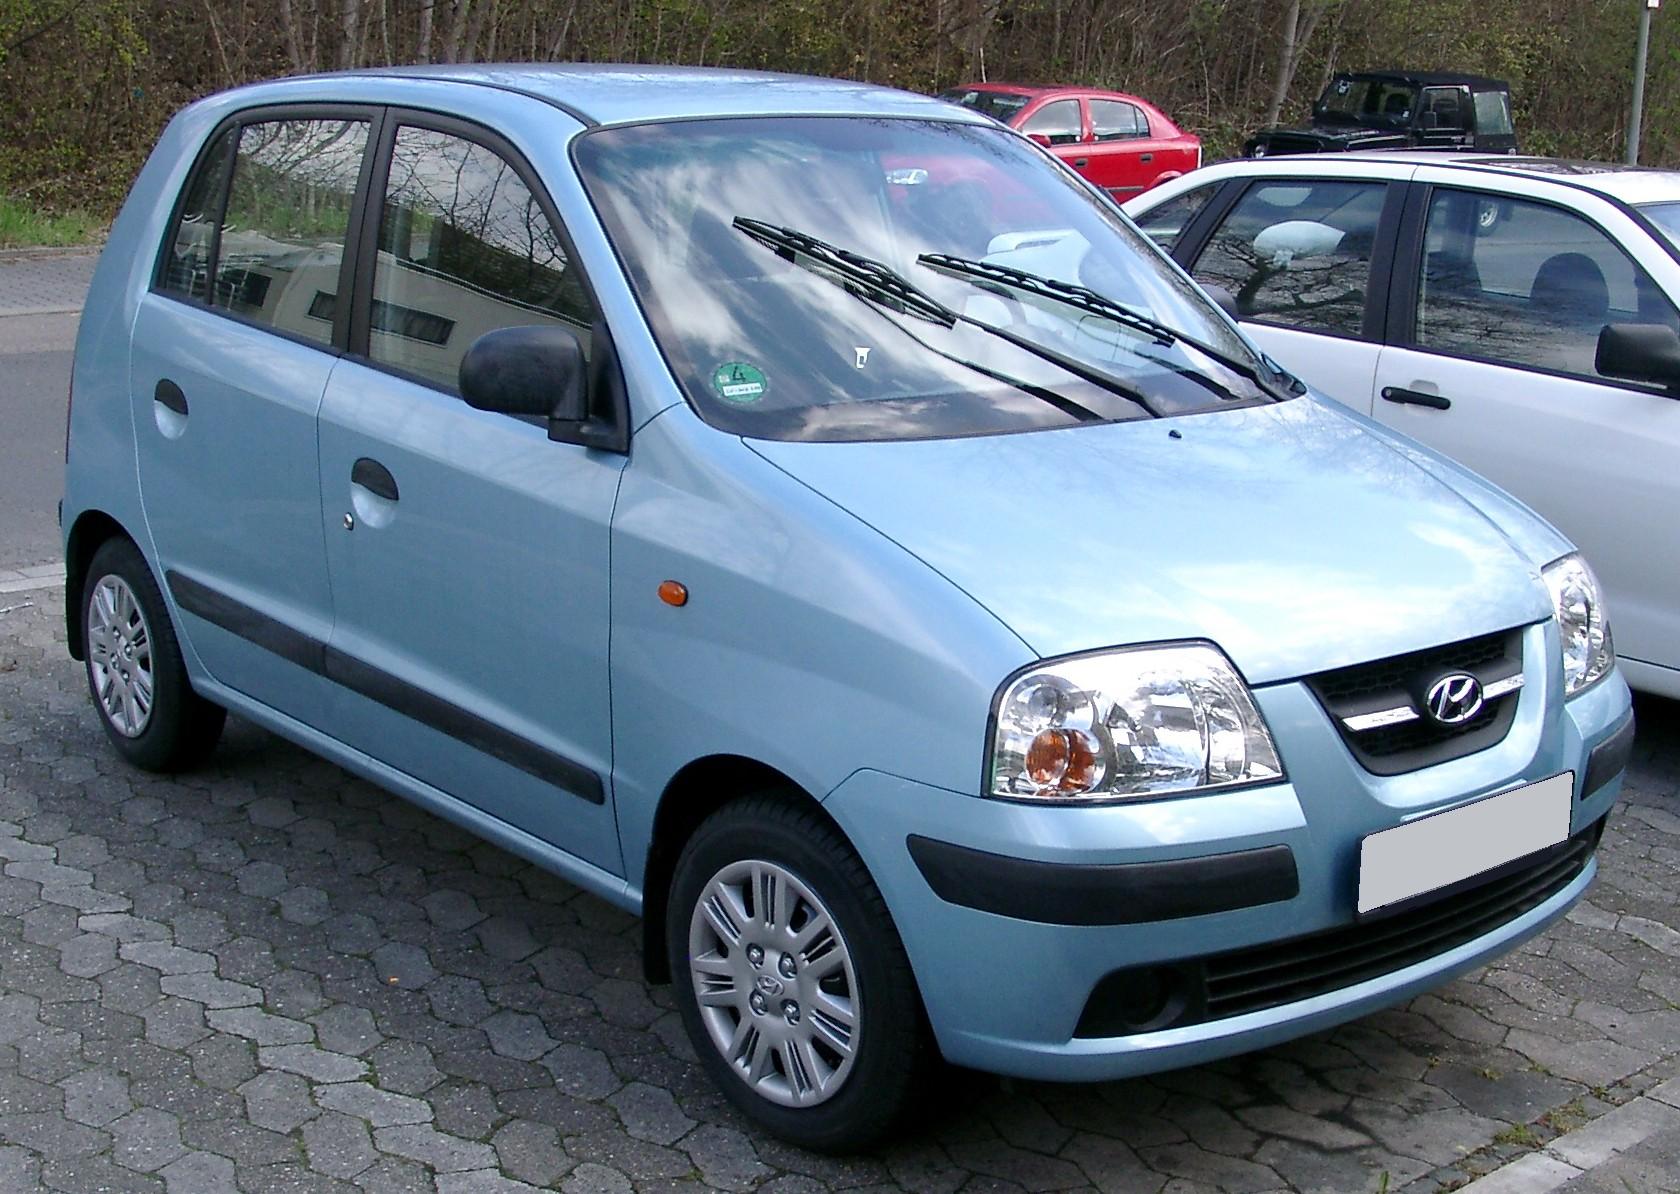 http://upload.wikimedia.org/wikipedia/commons/1/19/Hyundai_Atos_front_20080328.jpg